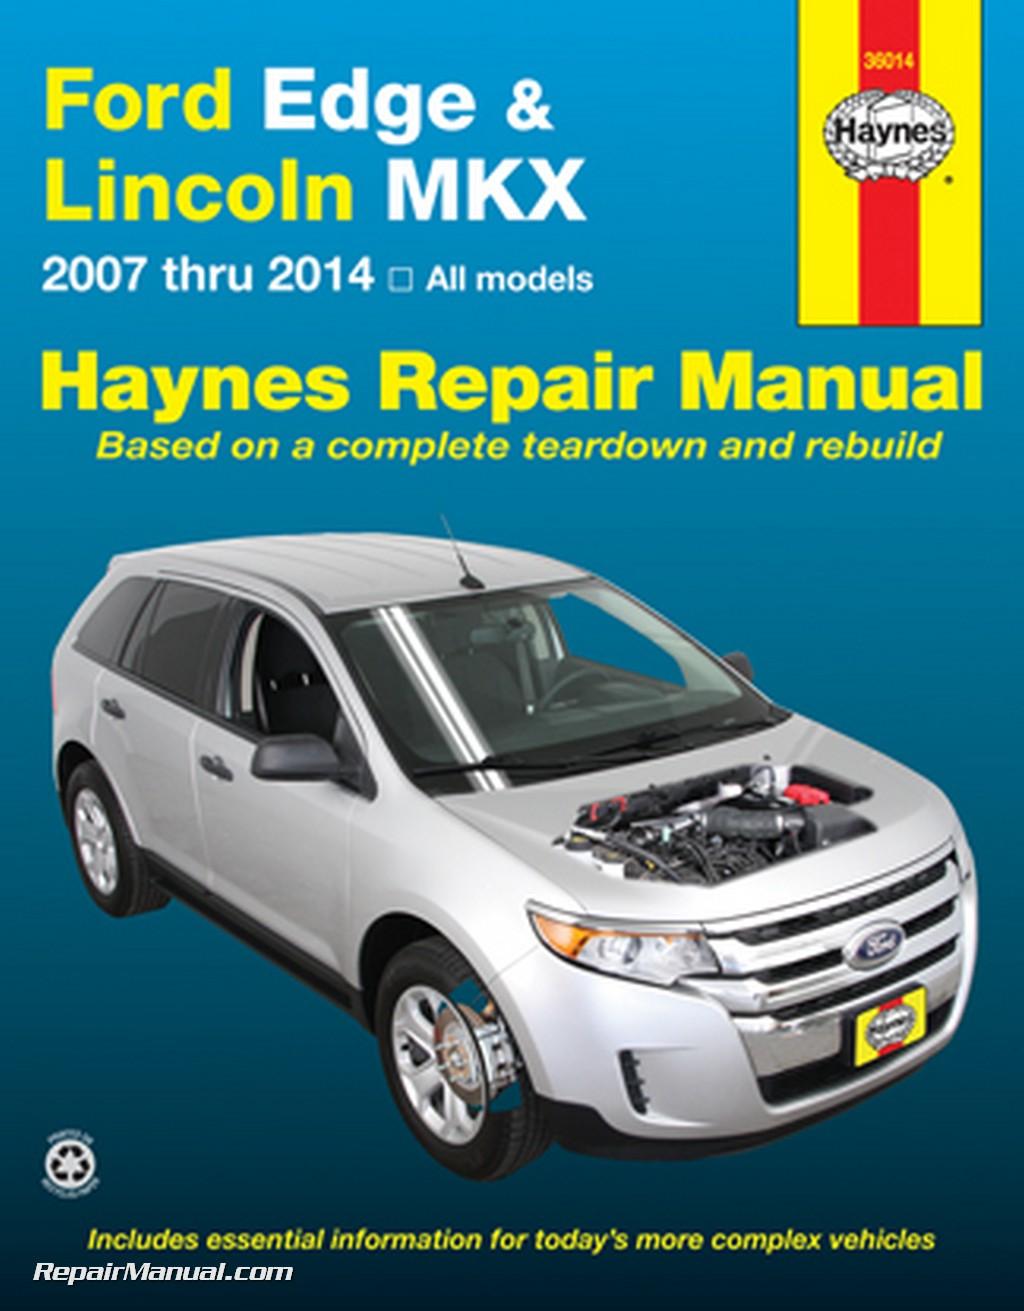 hight resolution of ford edge lincoln mkx haynes repair manual 2007 2014 hayne manual 2007 ford edge engine diagram